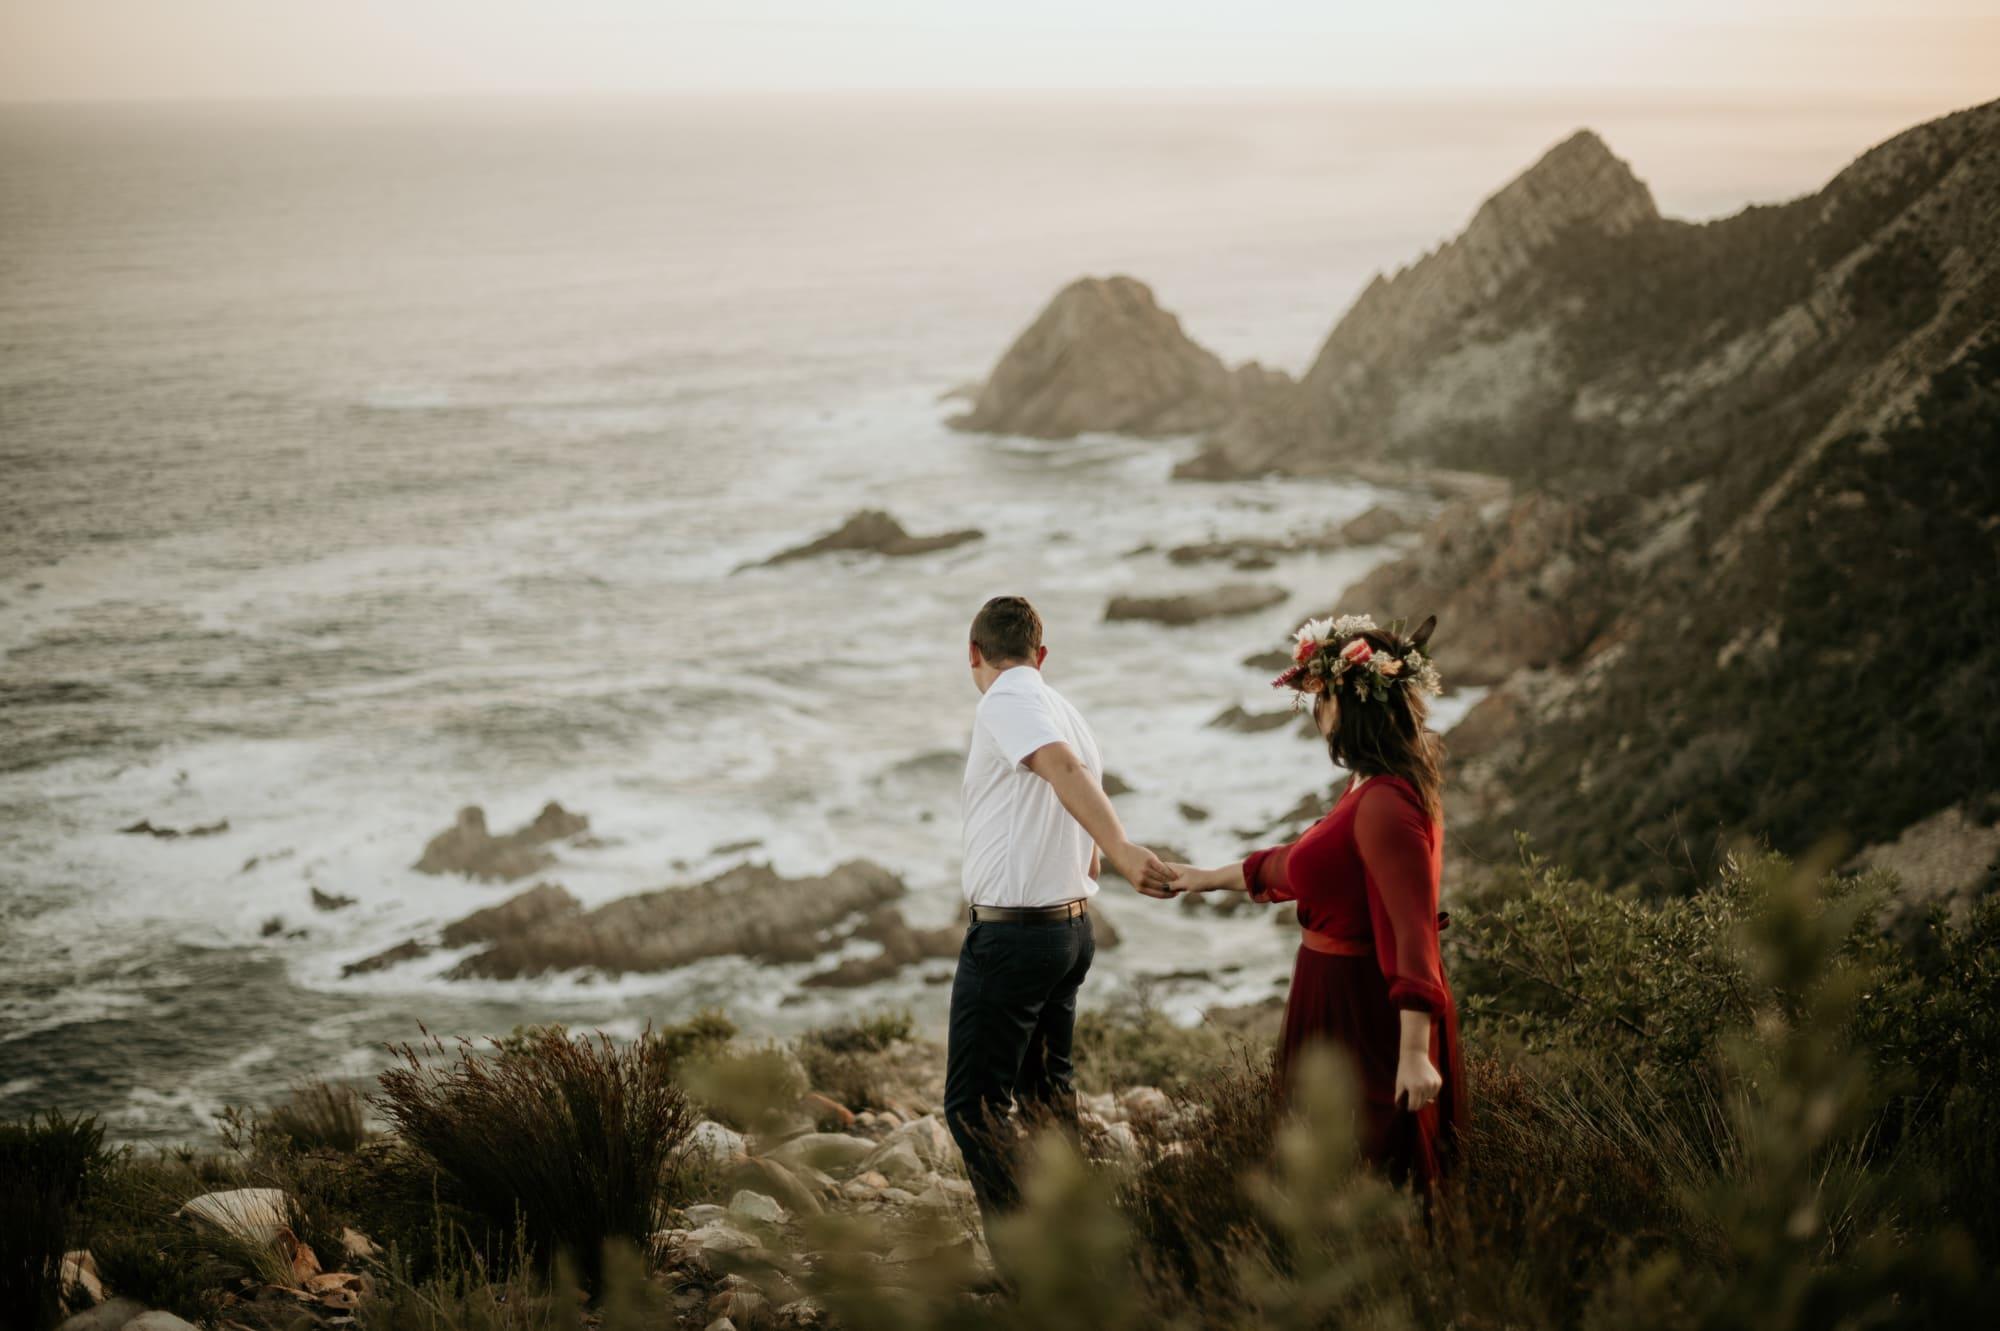 jesann-freddie-kranshoek-engagement-June-Richards-Photography-Destination-Weddings-Elopements-Garden-Route-37